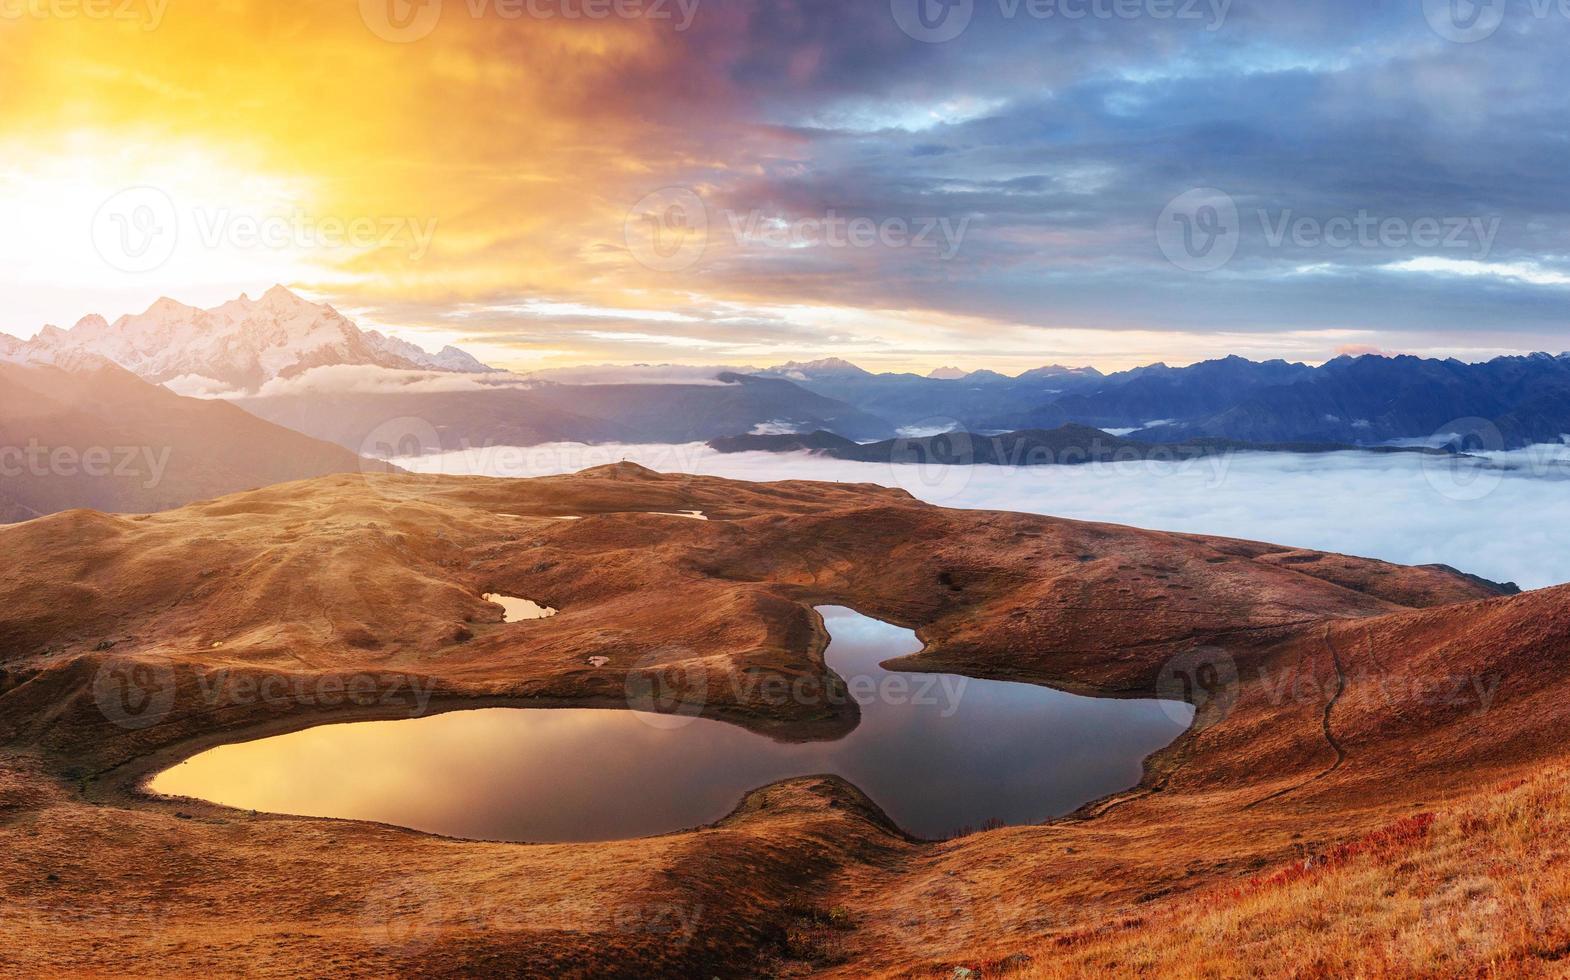 Sonnenuntergang am Bergsee koruldi. Obersvanetien, Georgien, Europa. foto